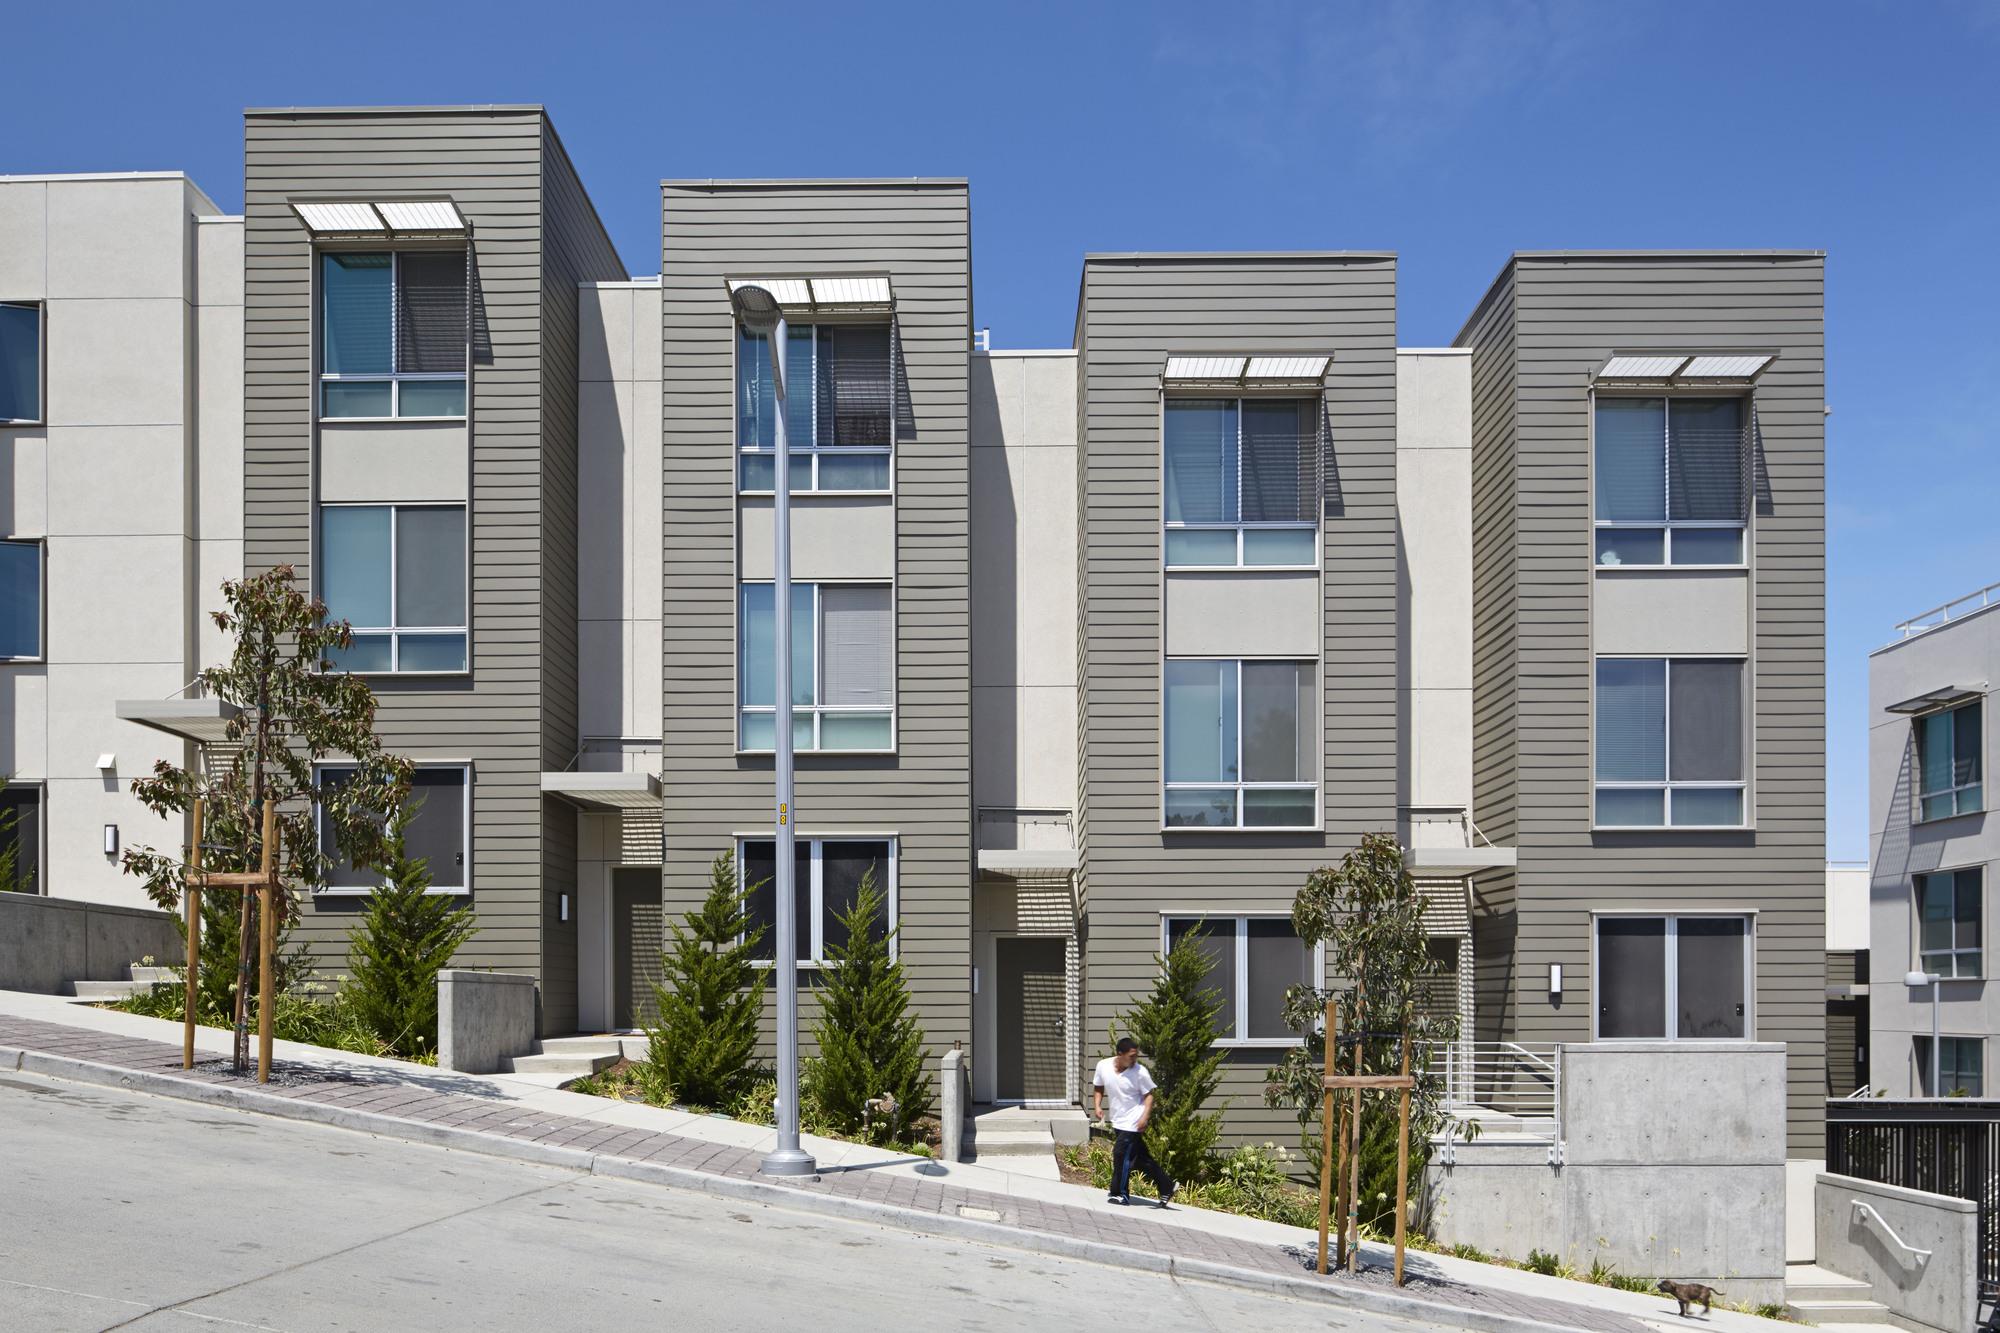 House hunters san francisco bay - Hunters View Housing Blocks 5 6 Paulett Taggart Architects Bruce Damonte